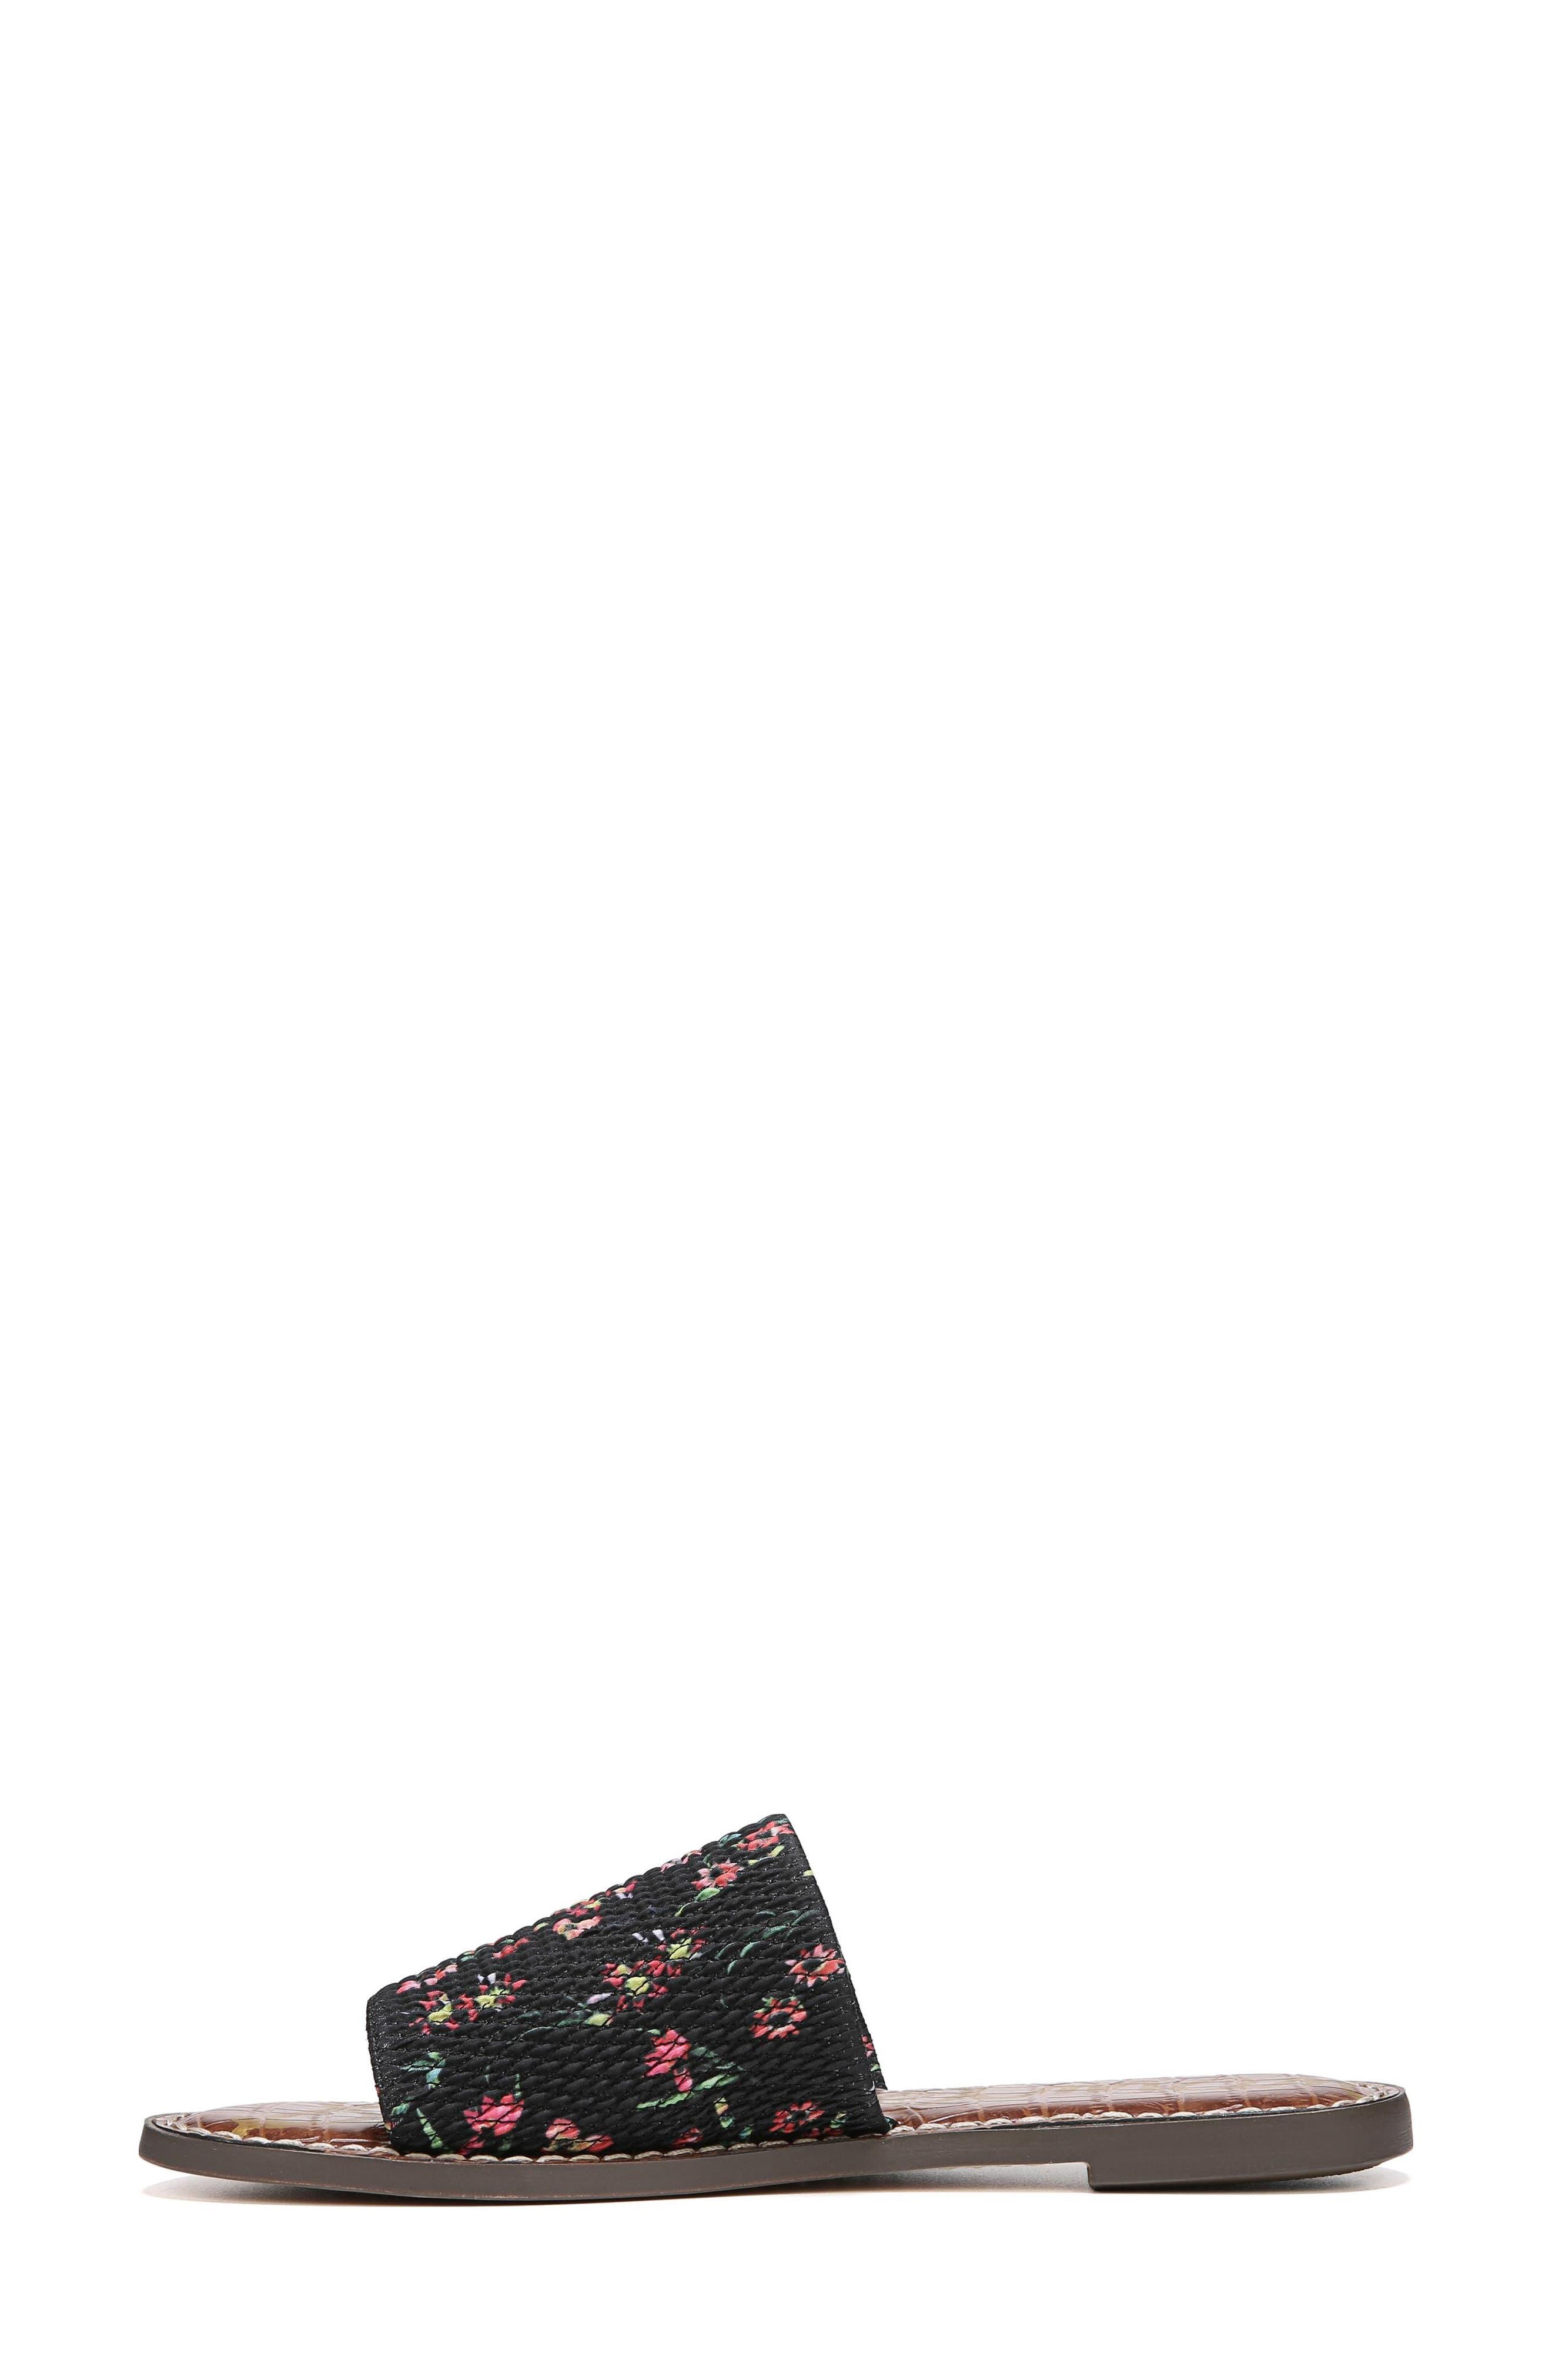 Gio Slide Sandal,                             Alternate thumbnail 3, color,                             BLACK FLORAL PRINT FABRIC